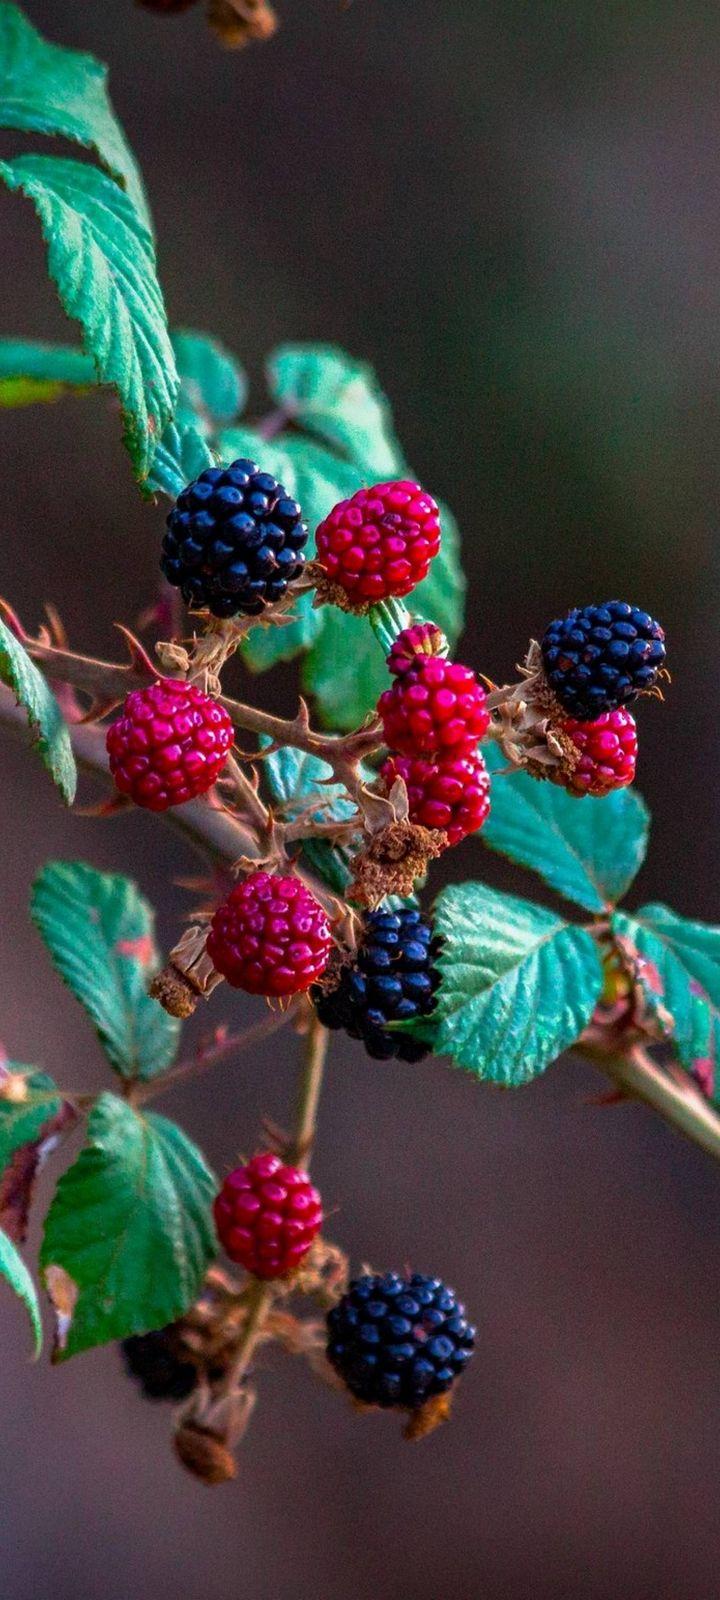 Fruits Raspberry Blackberry Wallpaper 720x1600